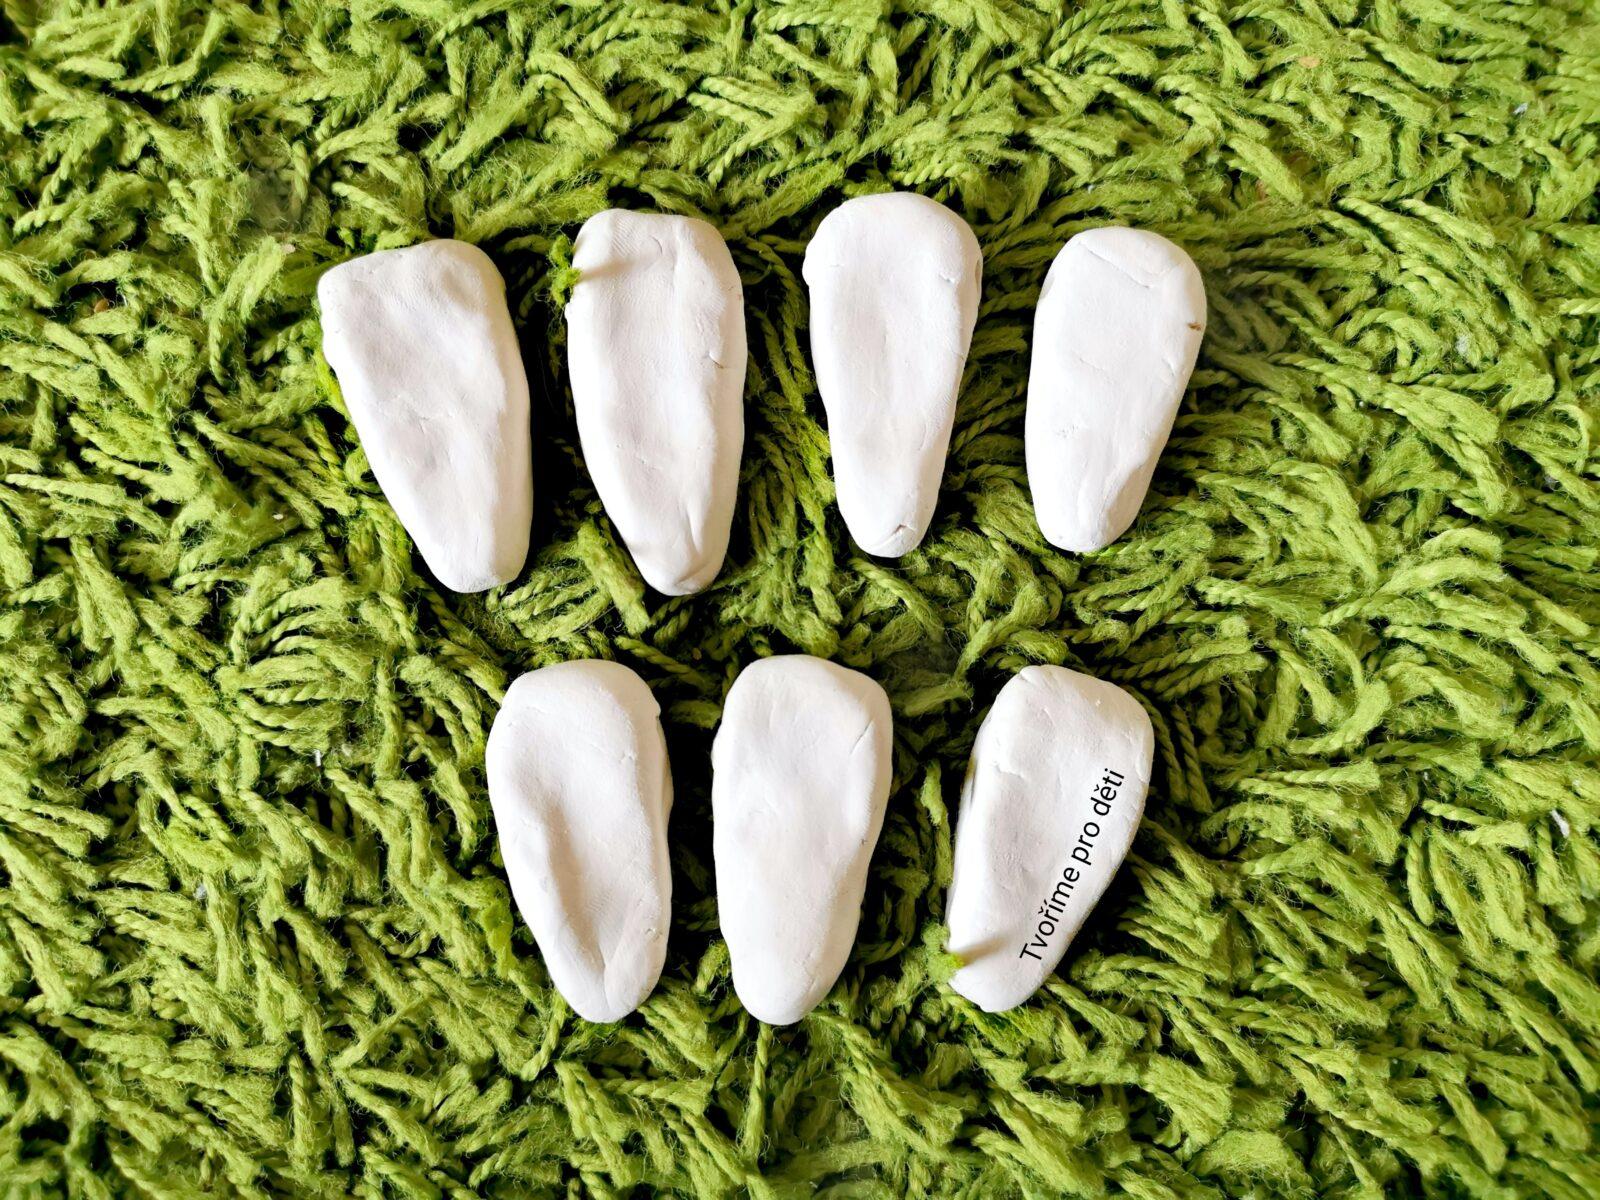 Zuby žraloka Viléma